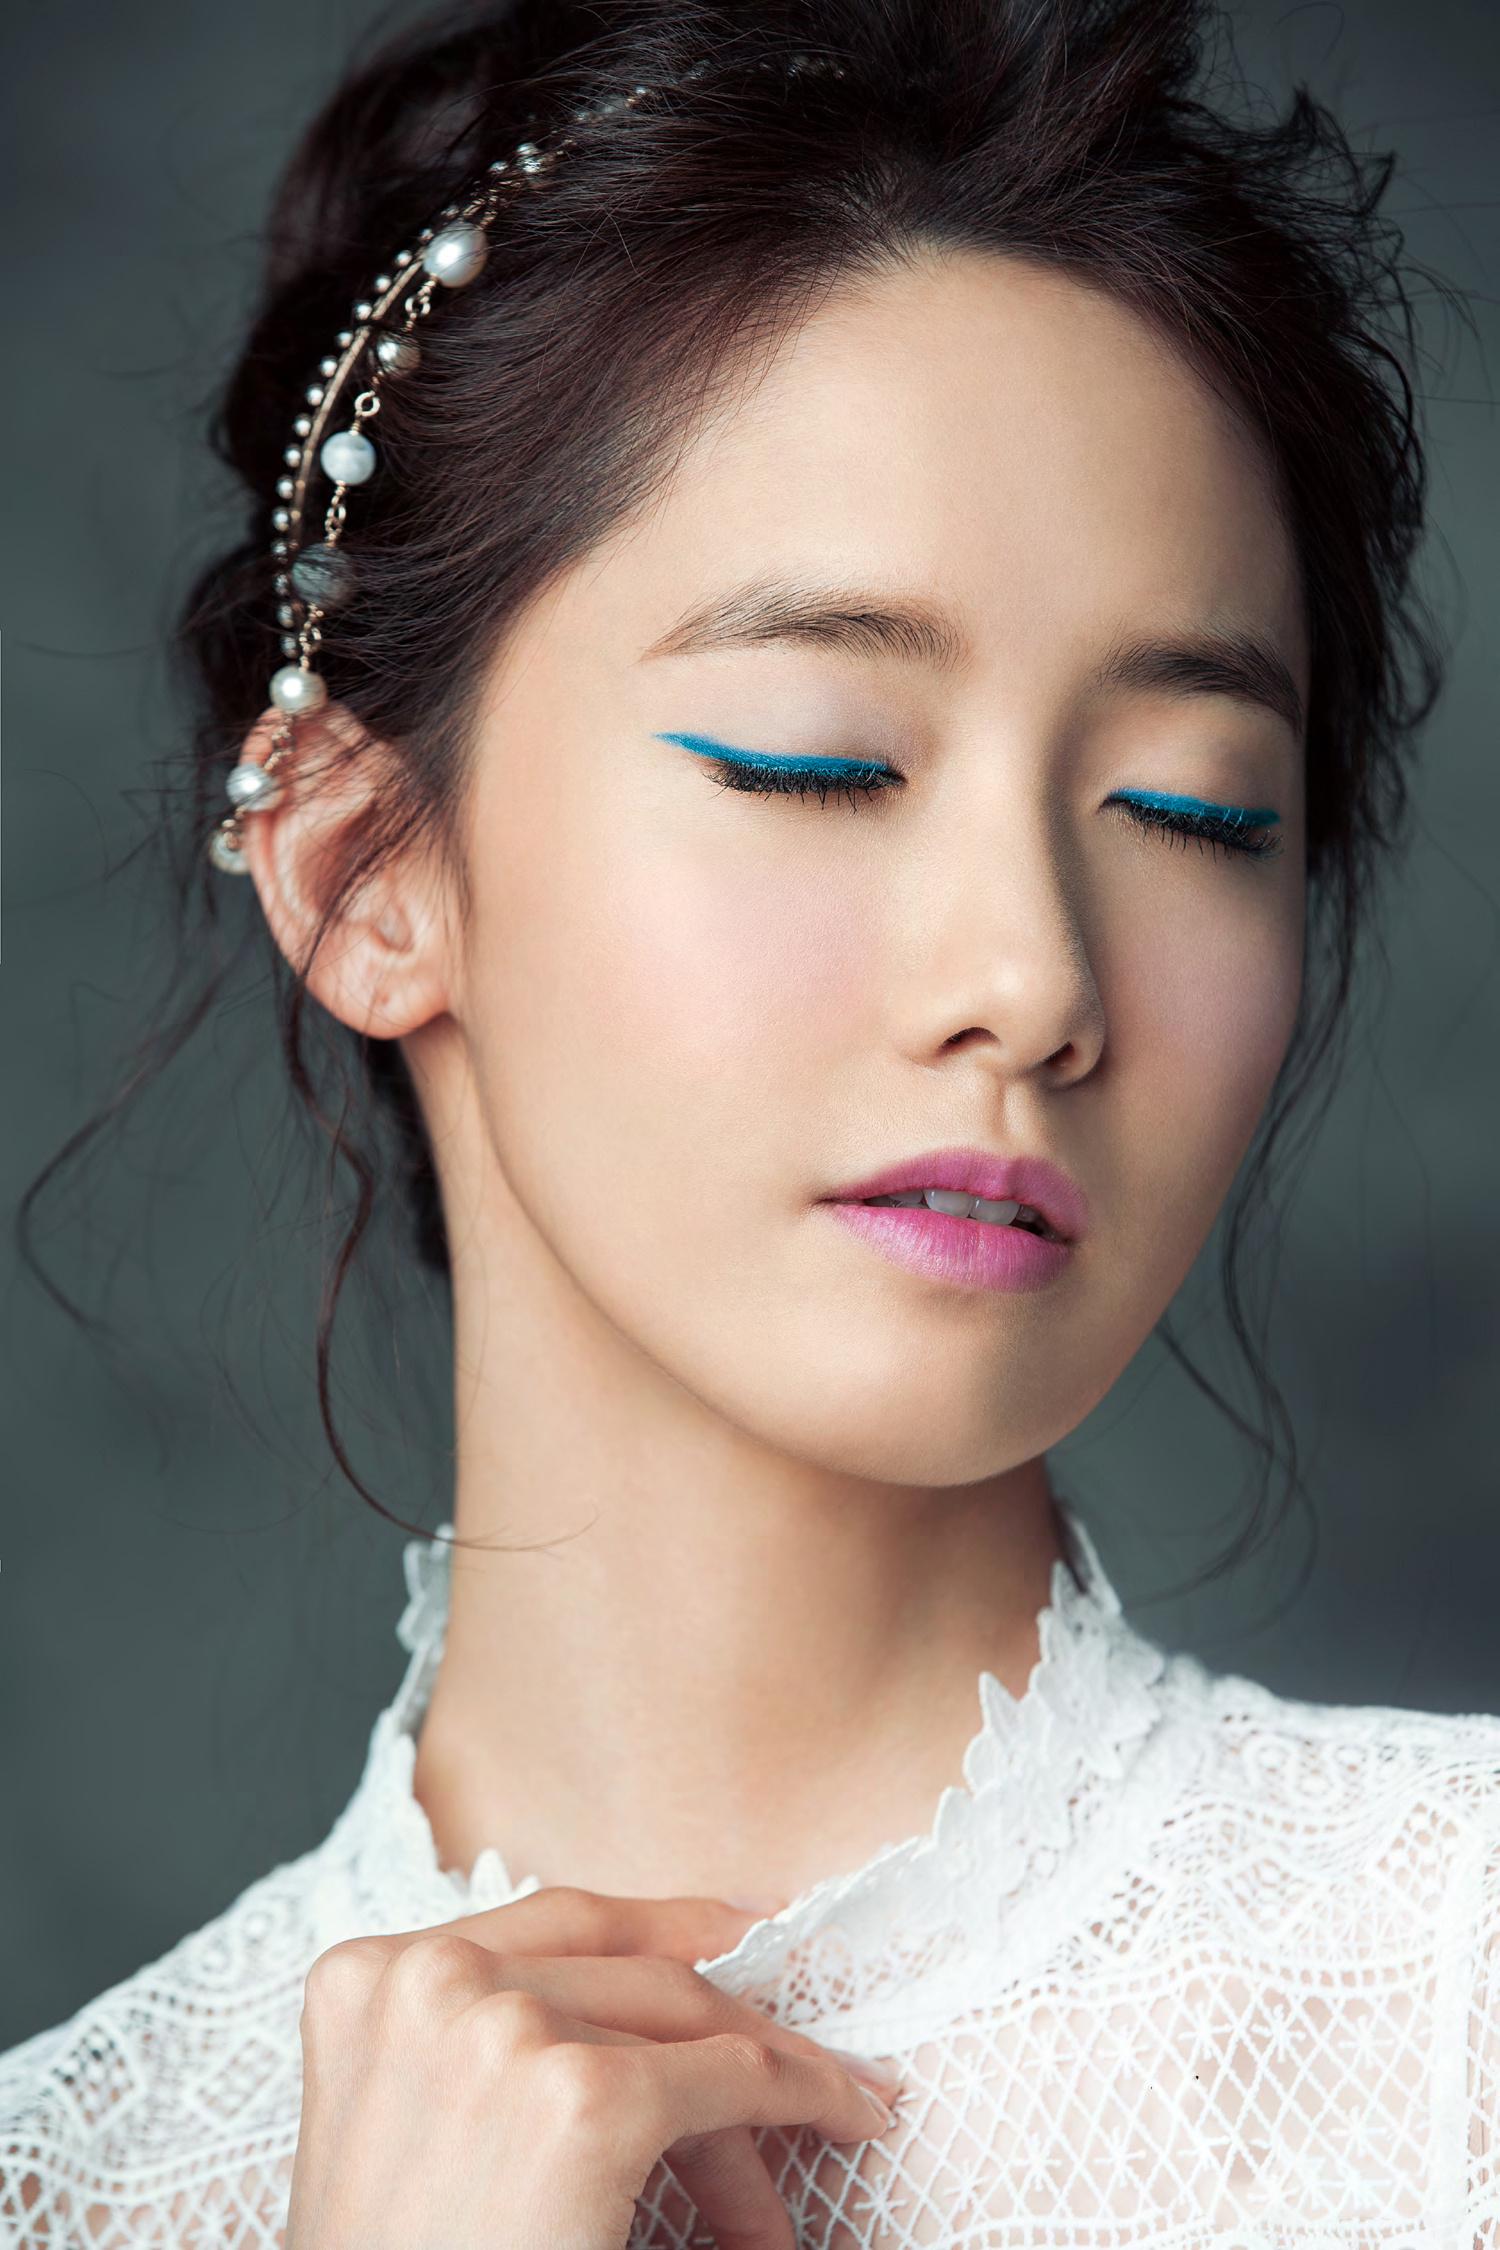 ♥Yoona Gee (Japanese ver)♥ - Kpop girl power Wallpaper